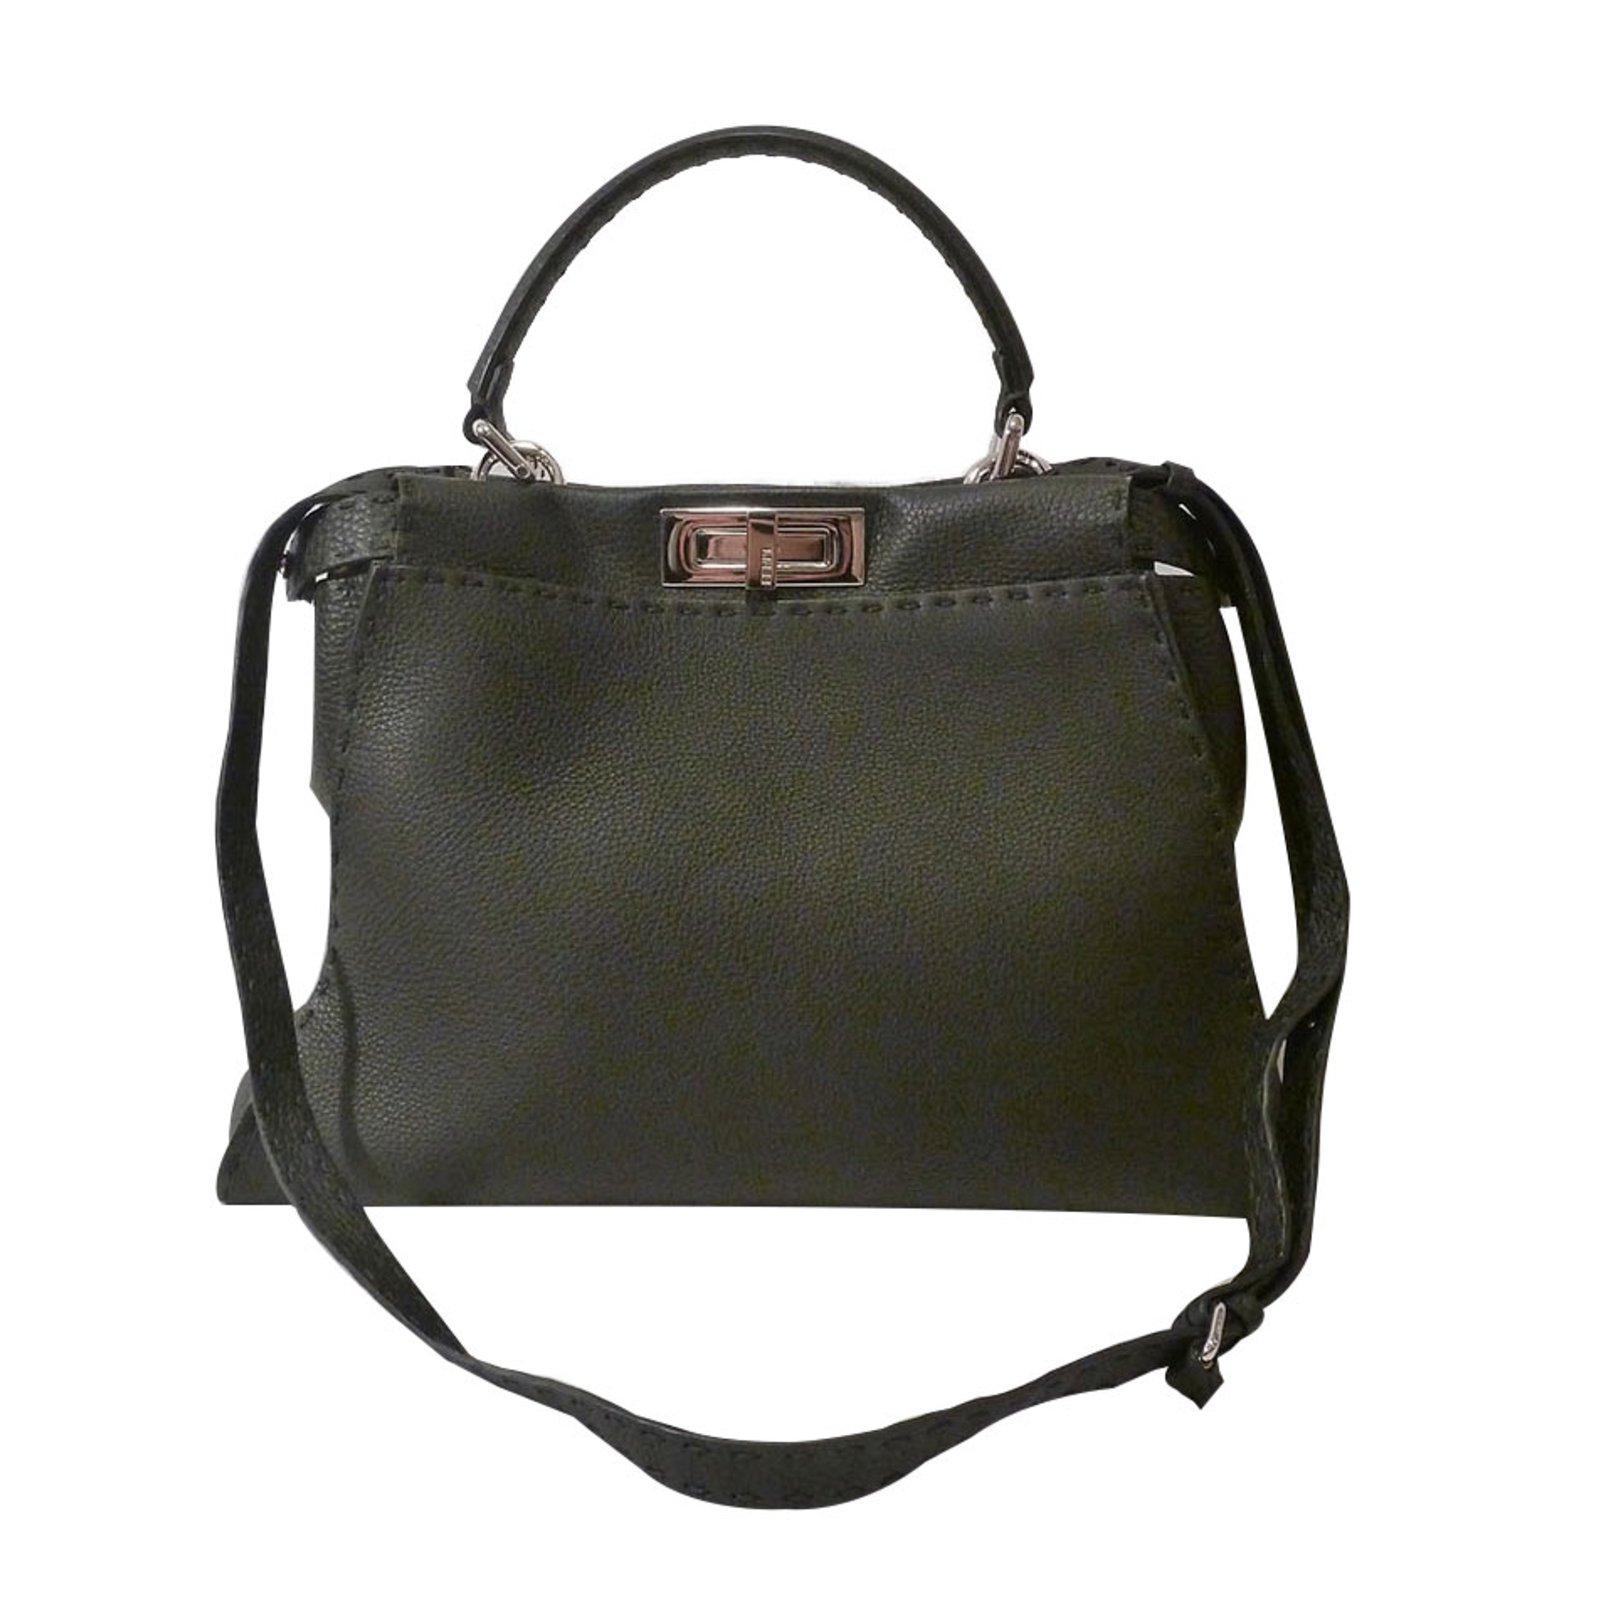 3235626477ef Fendi Regular Peekaboo Satchel Bag Totes Leather Black ref.87997 ...